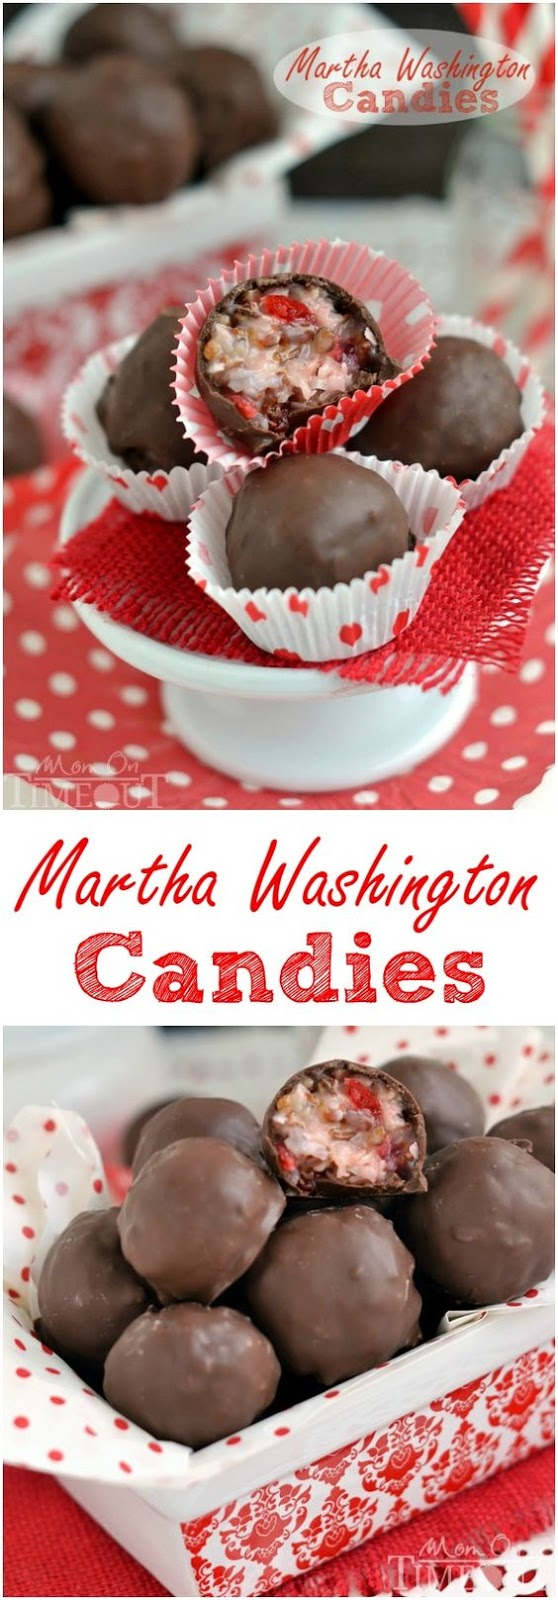 MARTHA WASHINGTON CANDIES